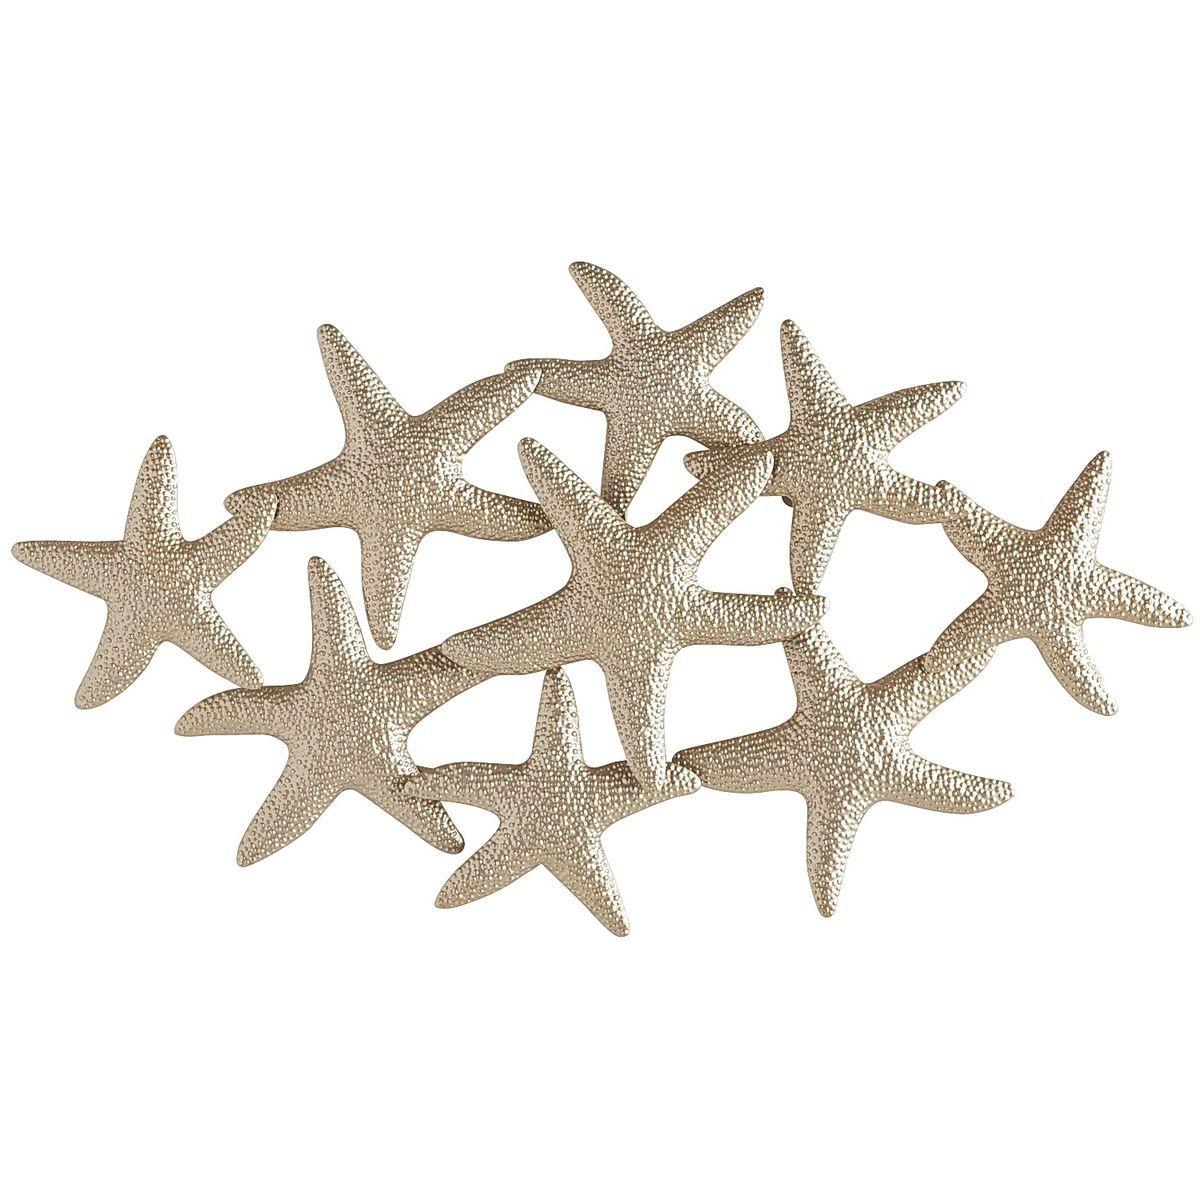 Genial Starfish Wall Decor   Champagne | Pier 1 Imports